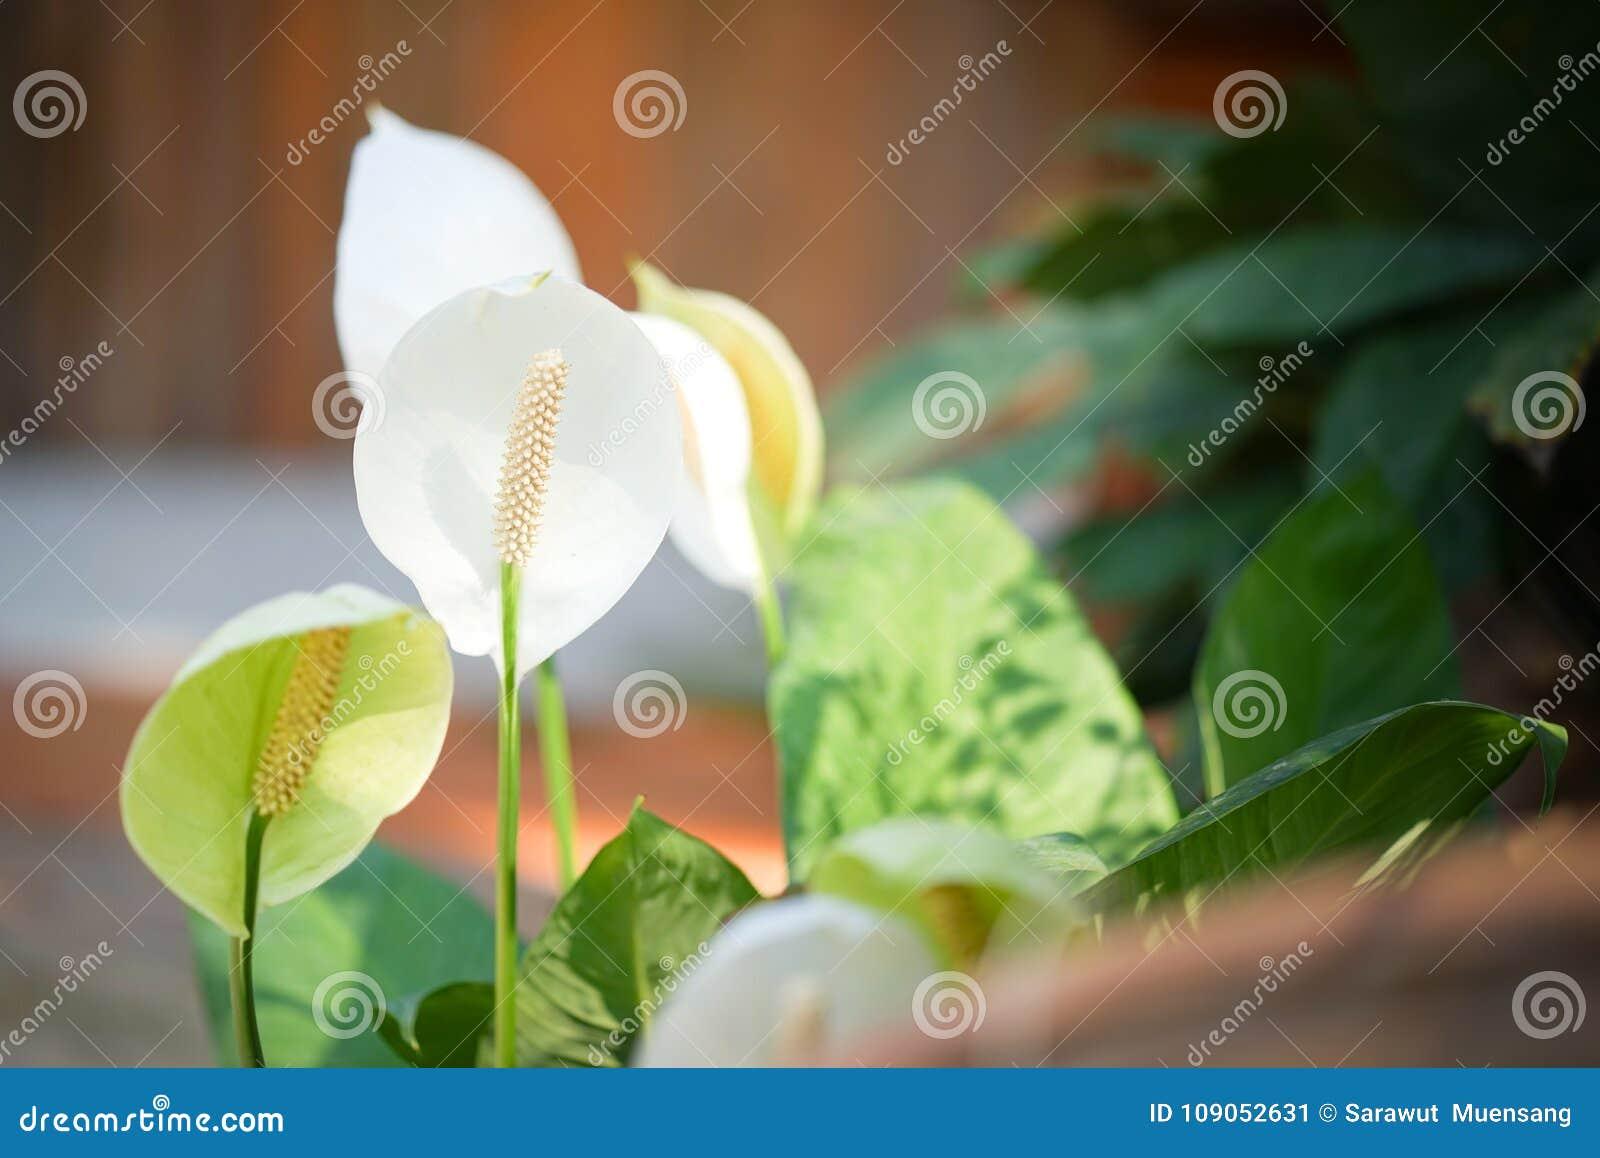 White Anthurium Flowers Stock Image Image Of Greenhouse 109052631